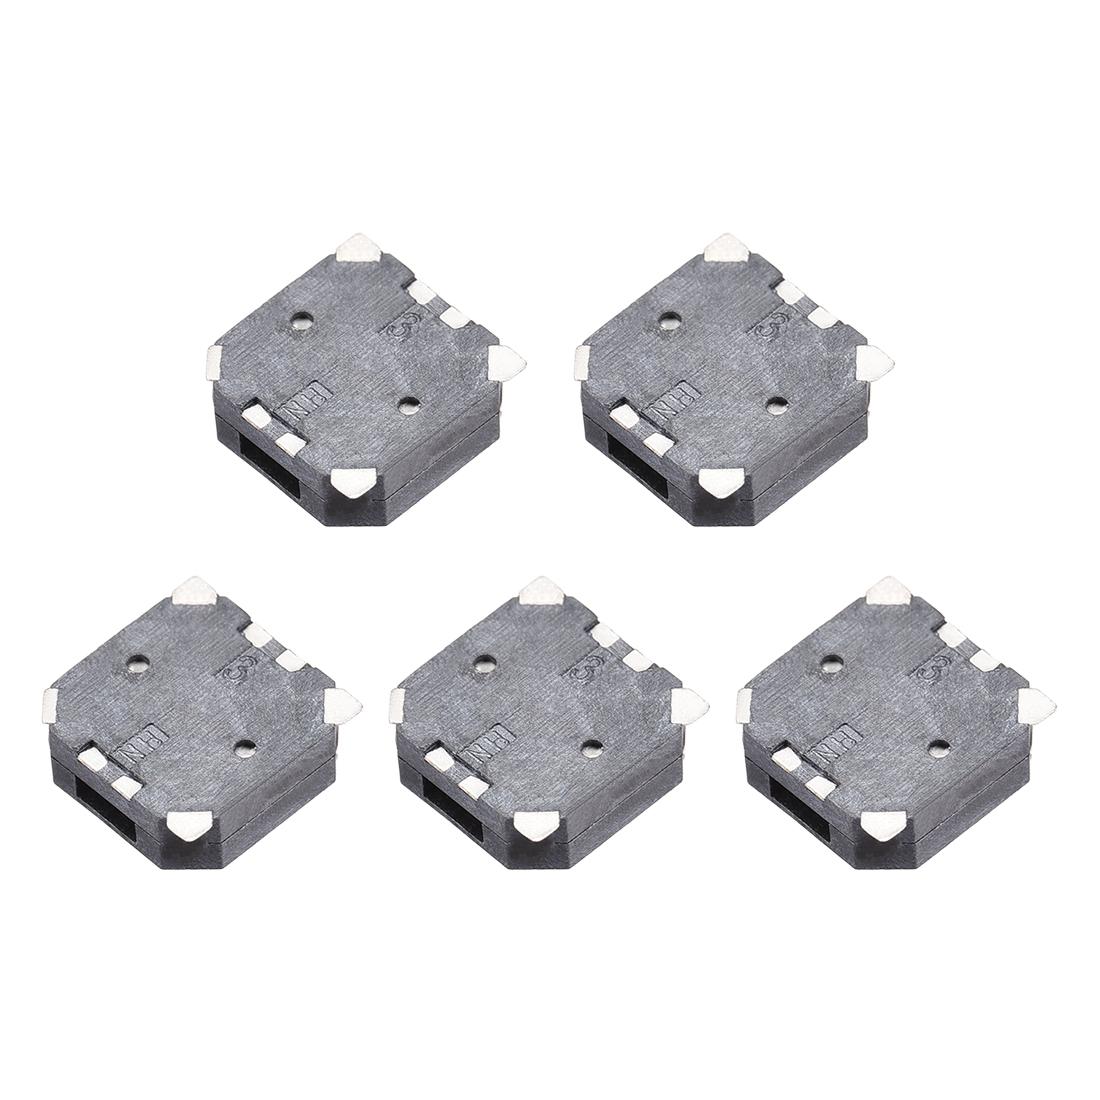 85dB 3.6V Passive Electronic Buzzer Electromagnetic Beep Piezo Alarm Ringer 5Pcs